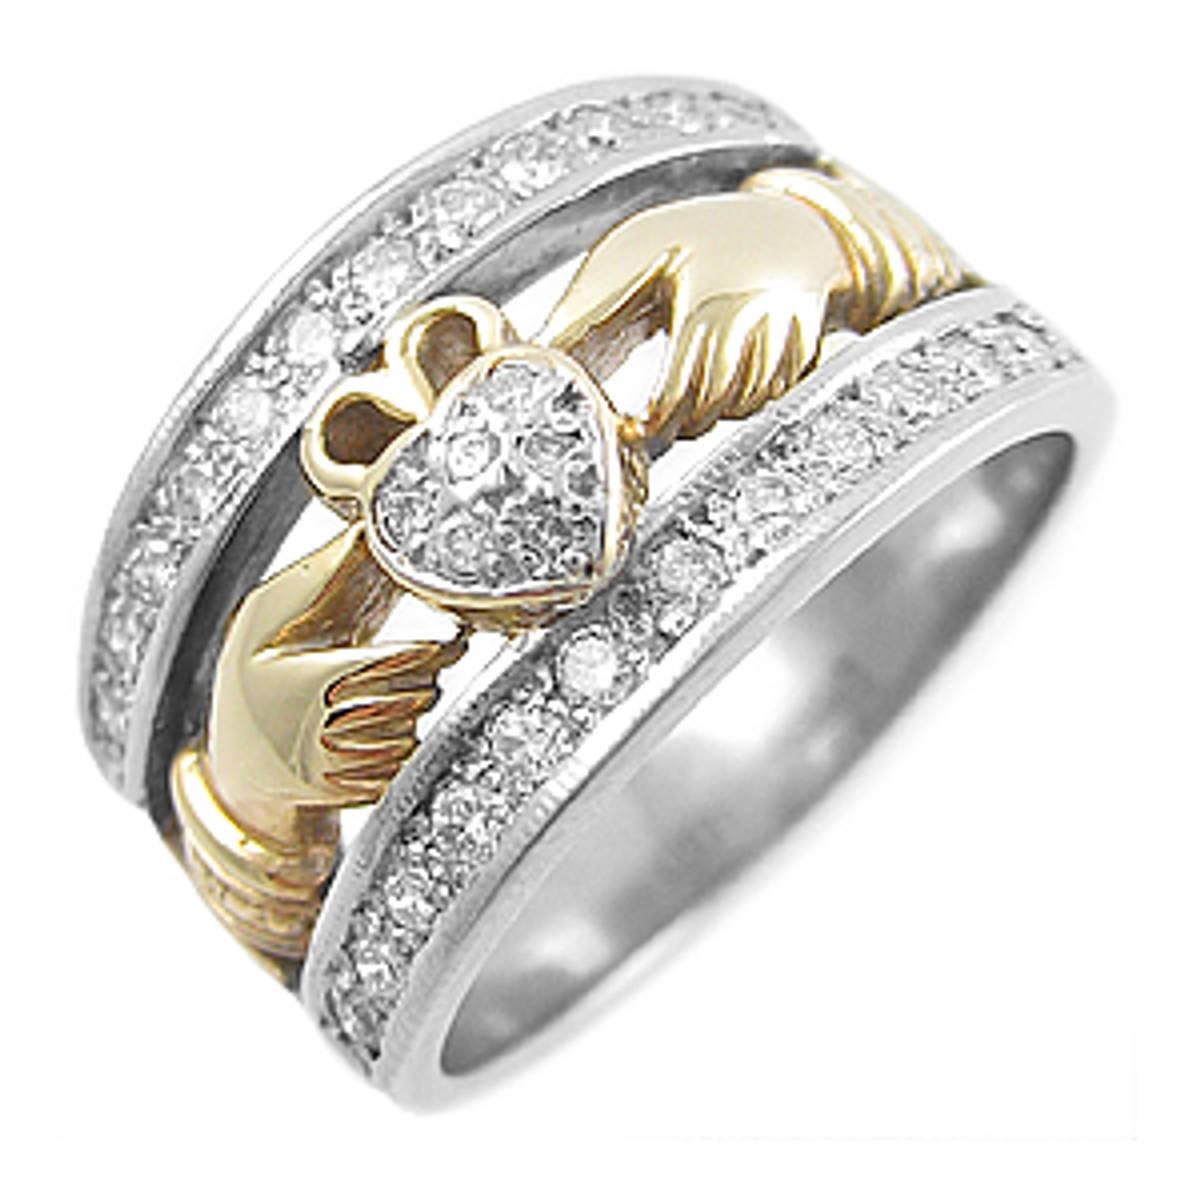 Irish made14 carat white/yellow gold 0.50ctsPastel set diamonds claddagh engagement ring